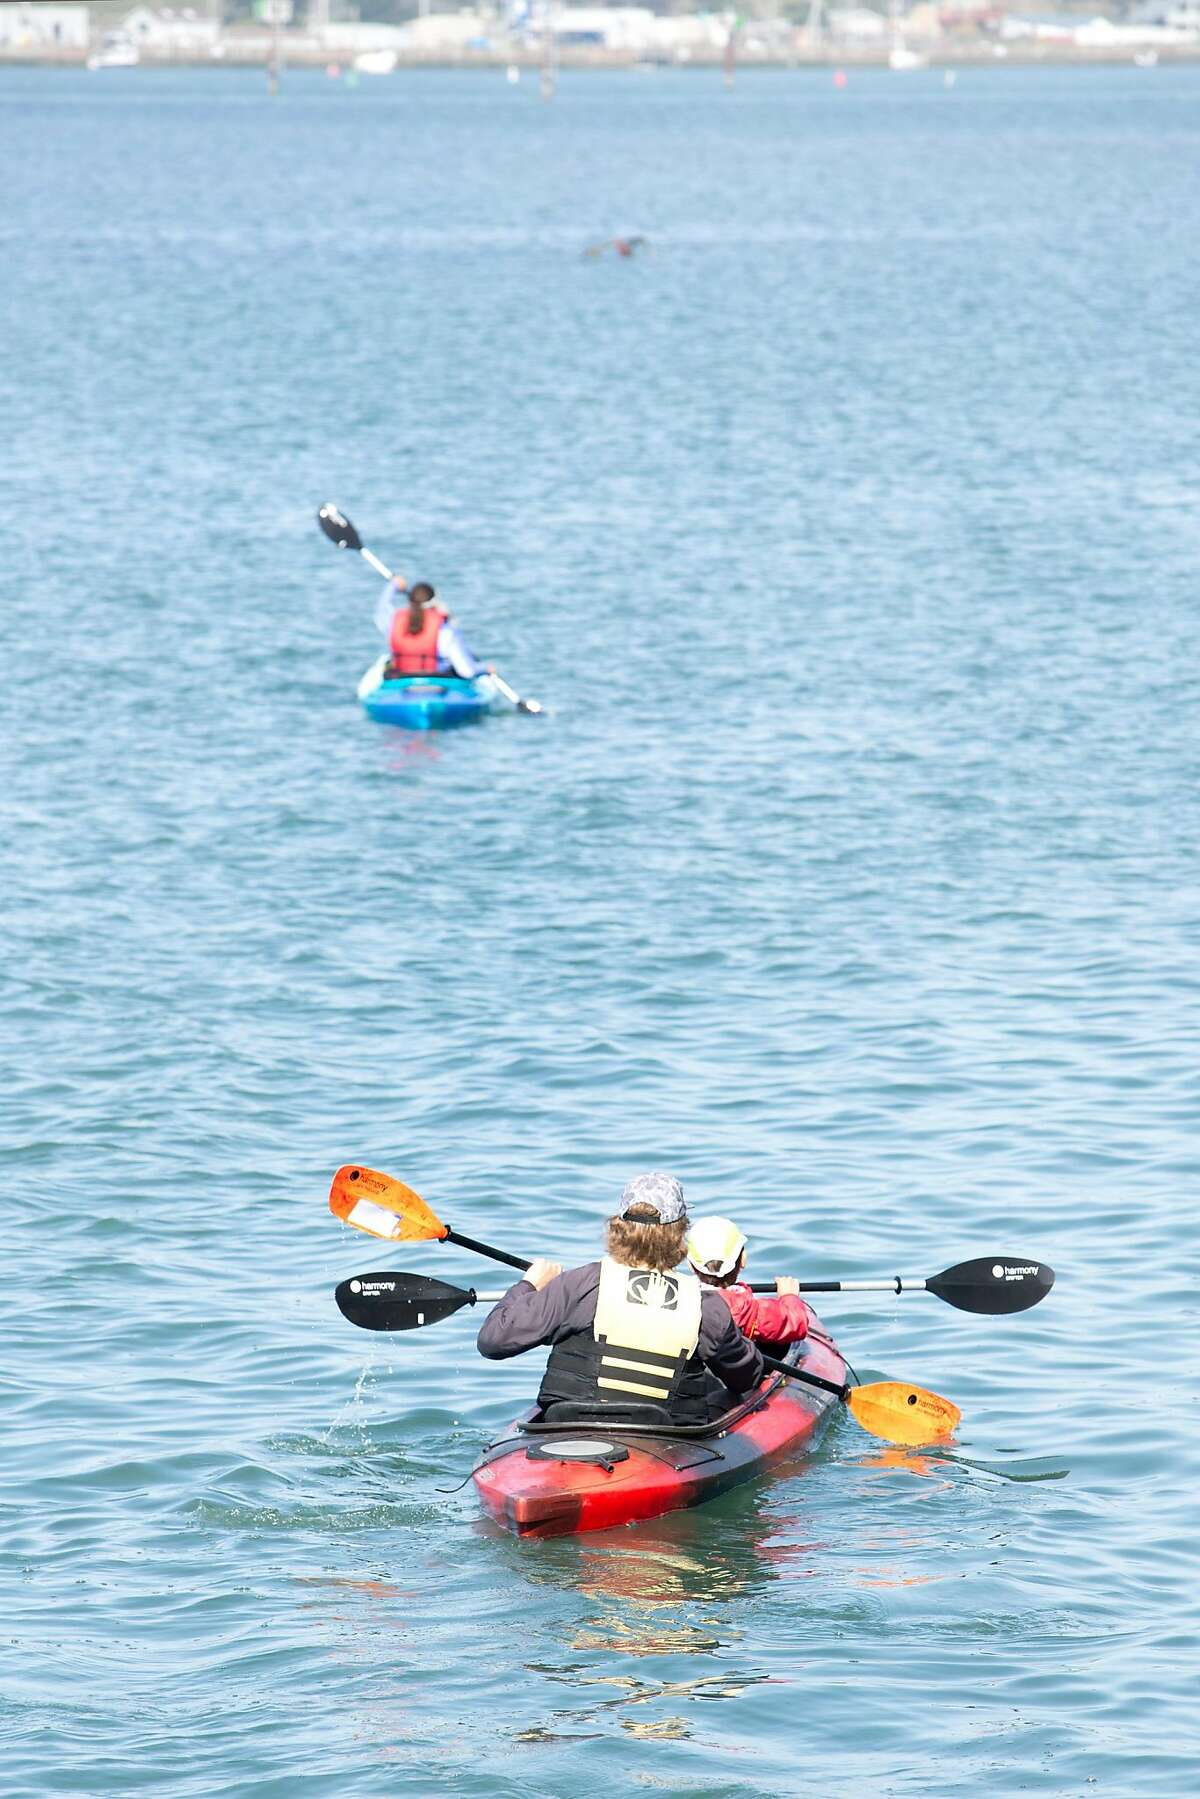 Bob Miller of Bodega Bay Surf Shack takes small groups on kayak tours of the Bay.